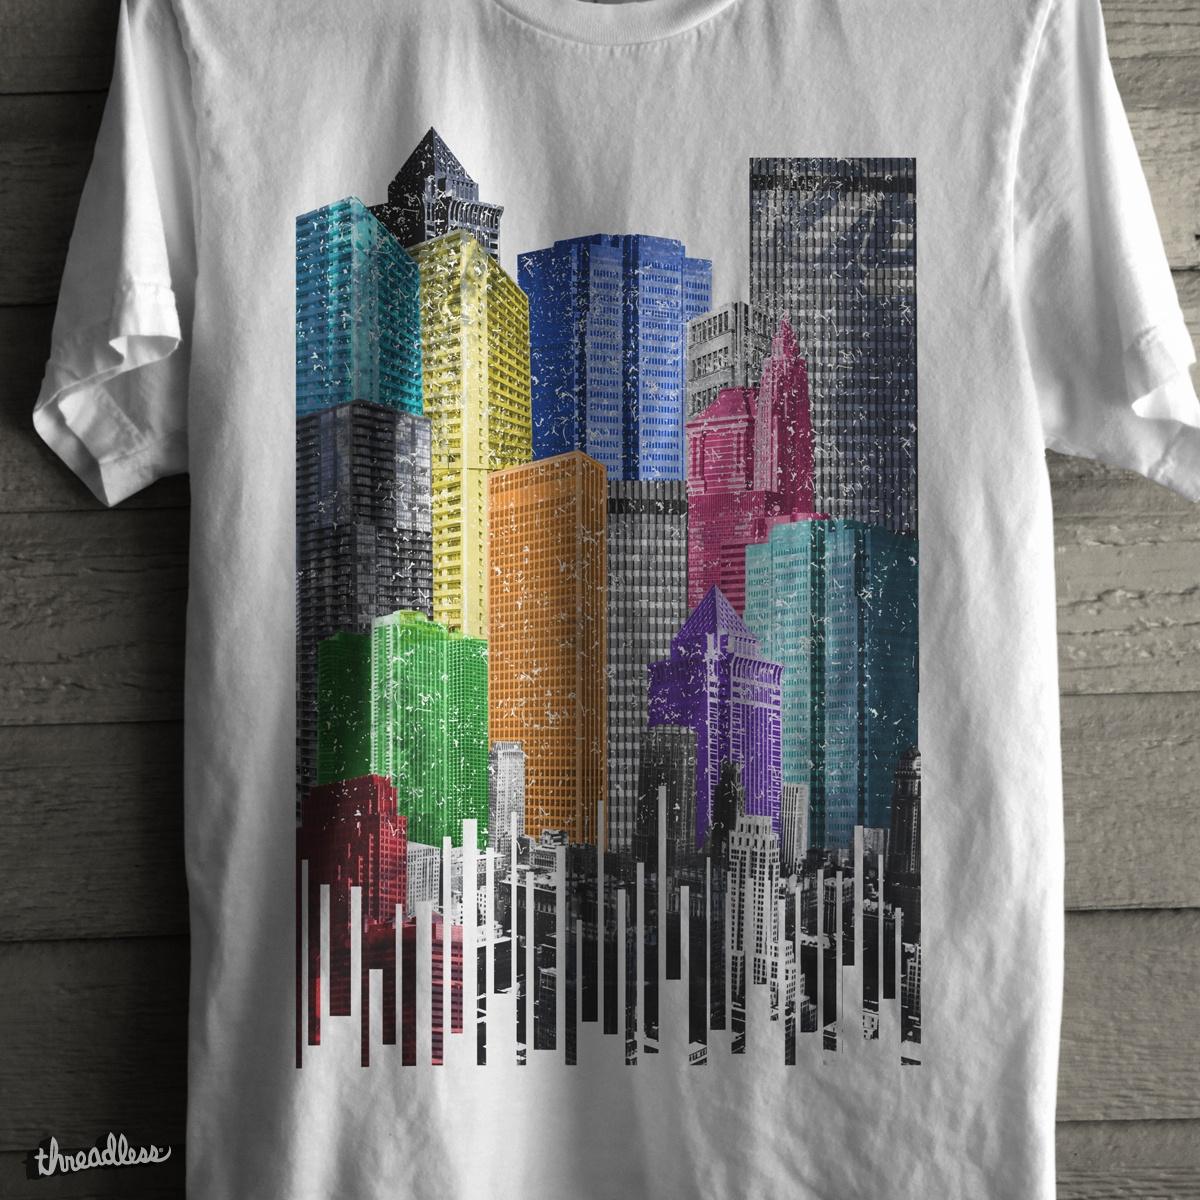 Urban City by nils285 on Threadless